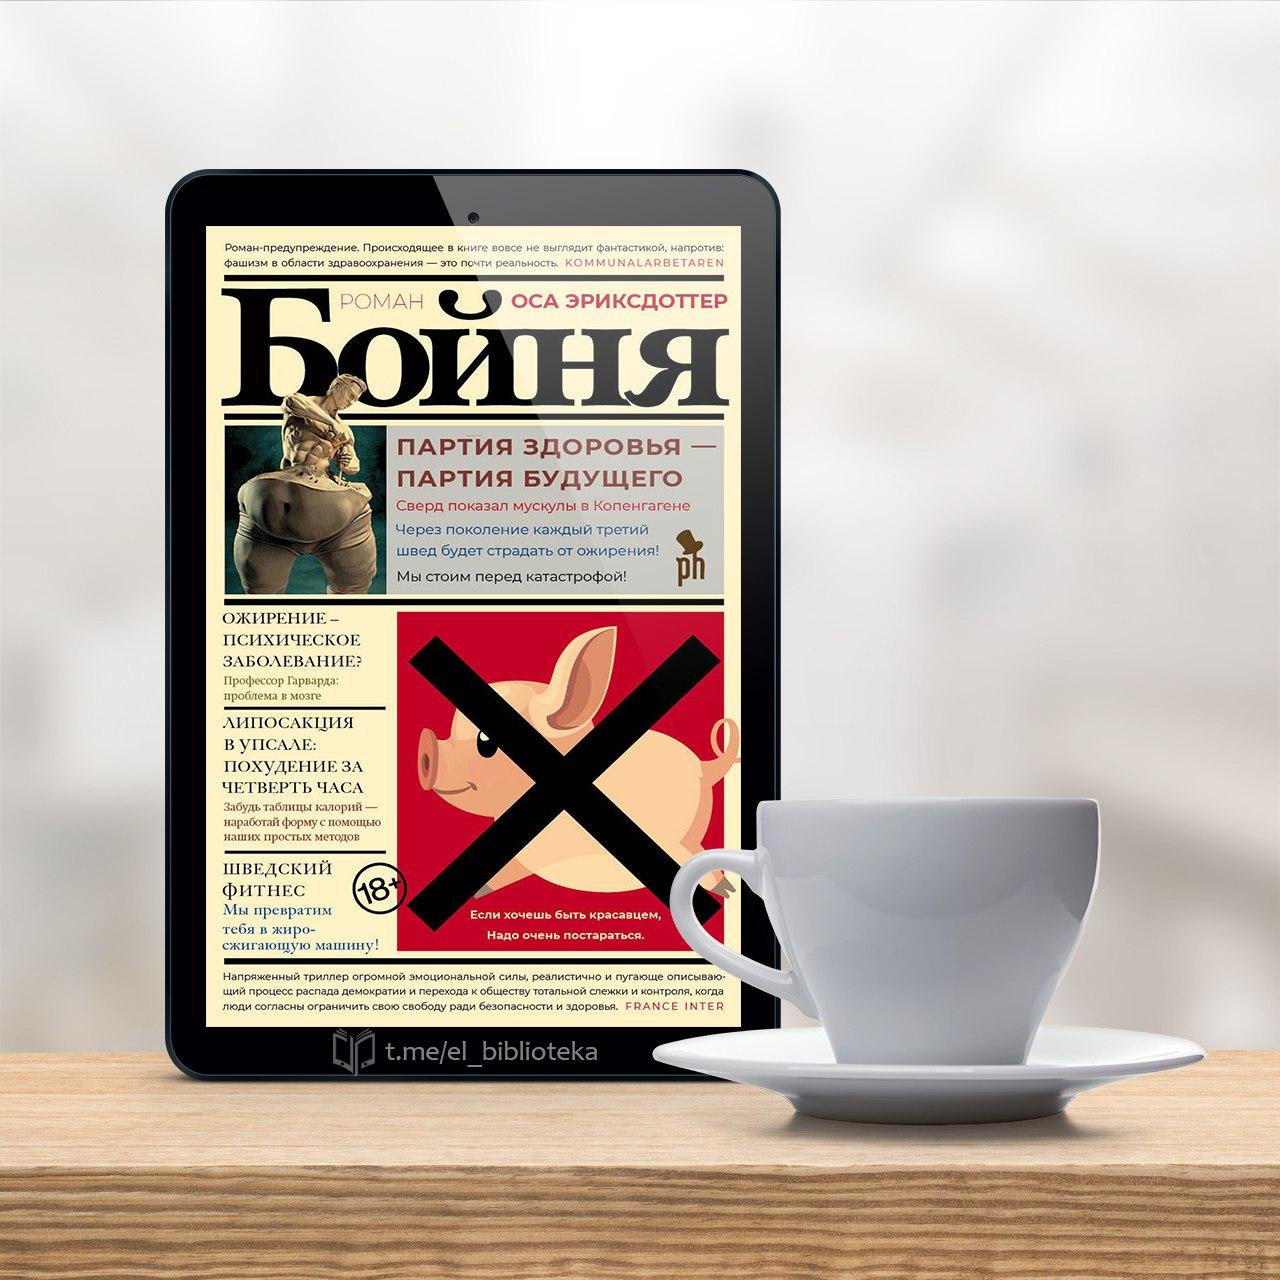  Бойня  Автор:  Эриксдоттер_Оса  Год издания: 2021   Жанр(ы):...